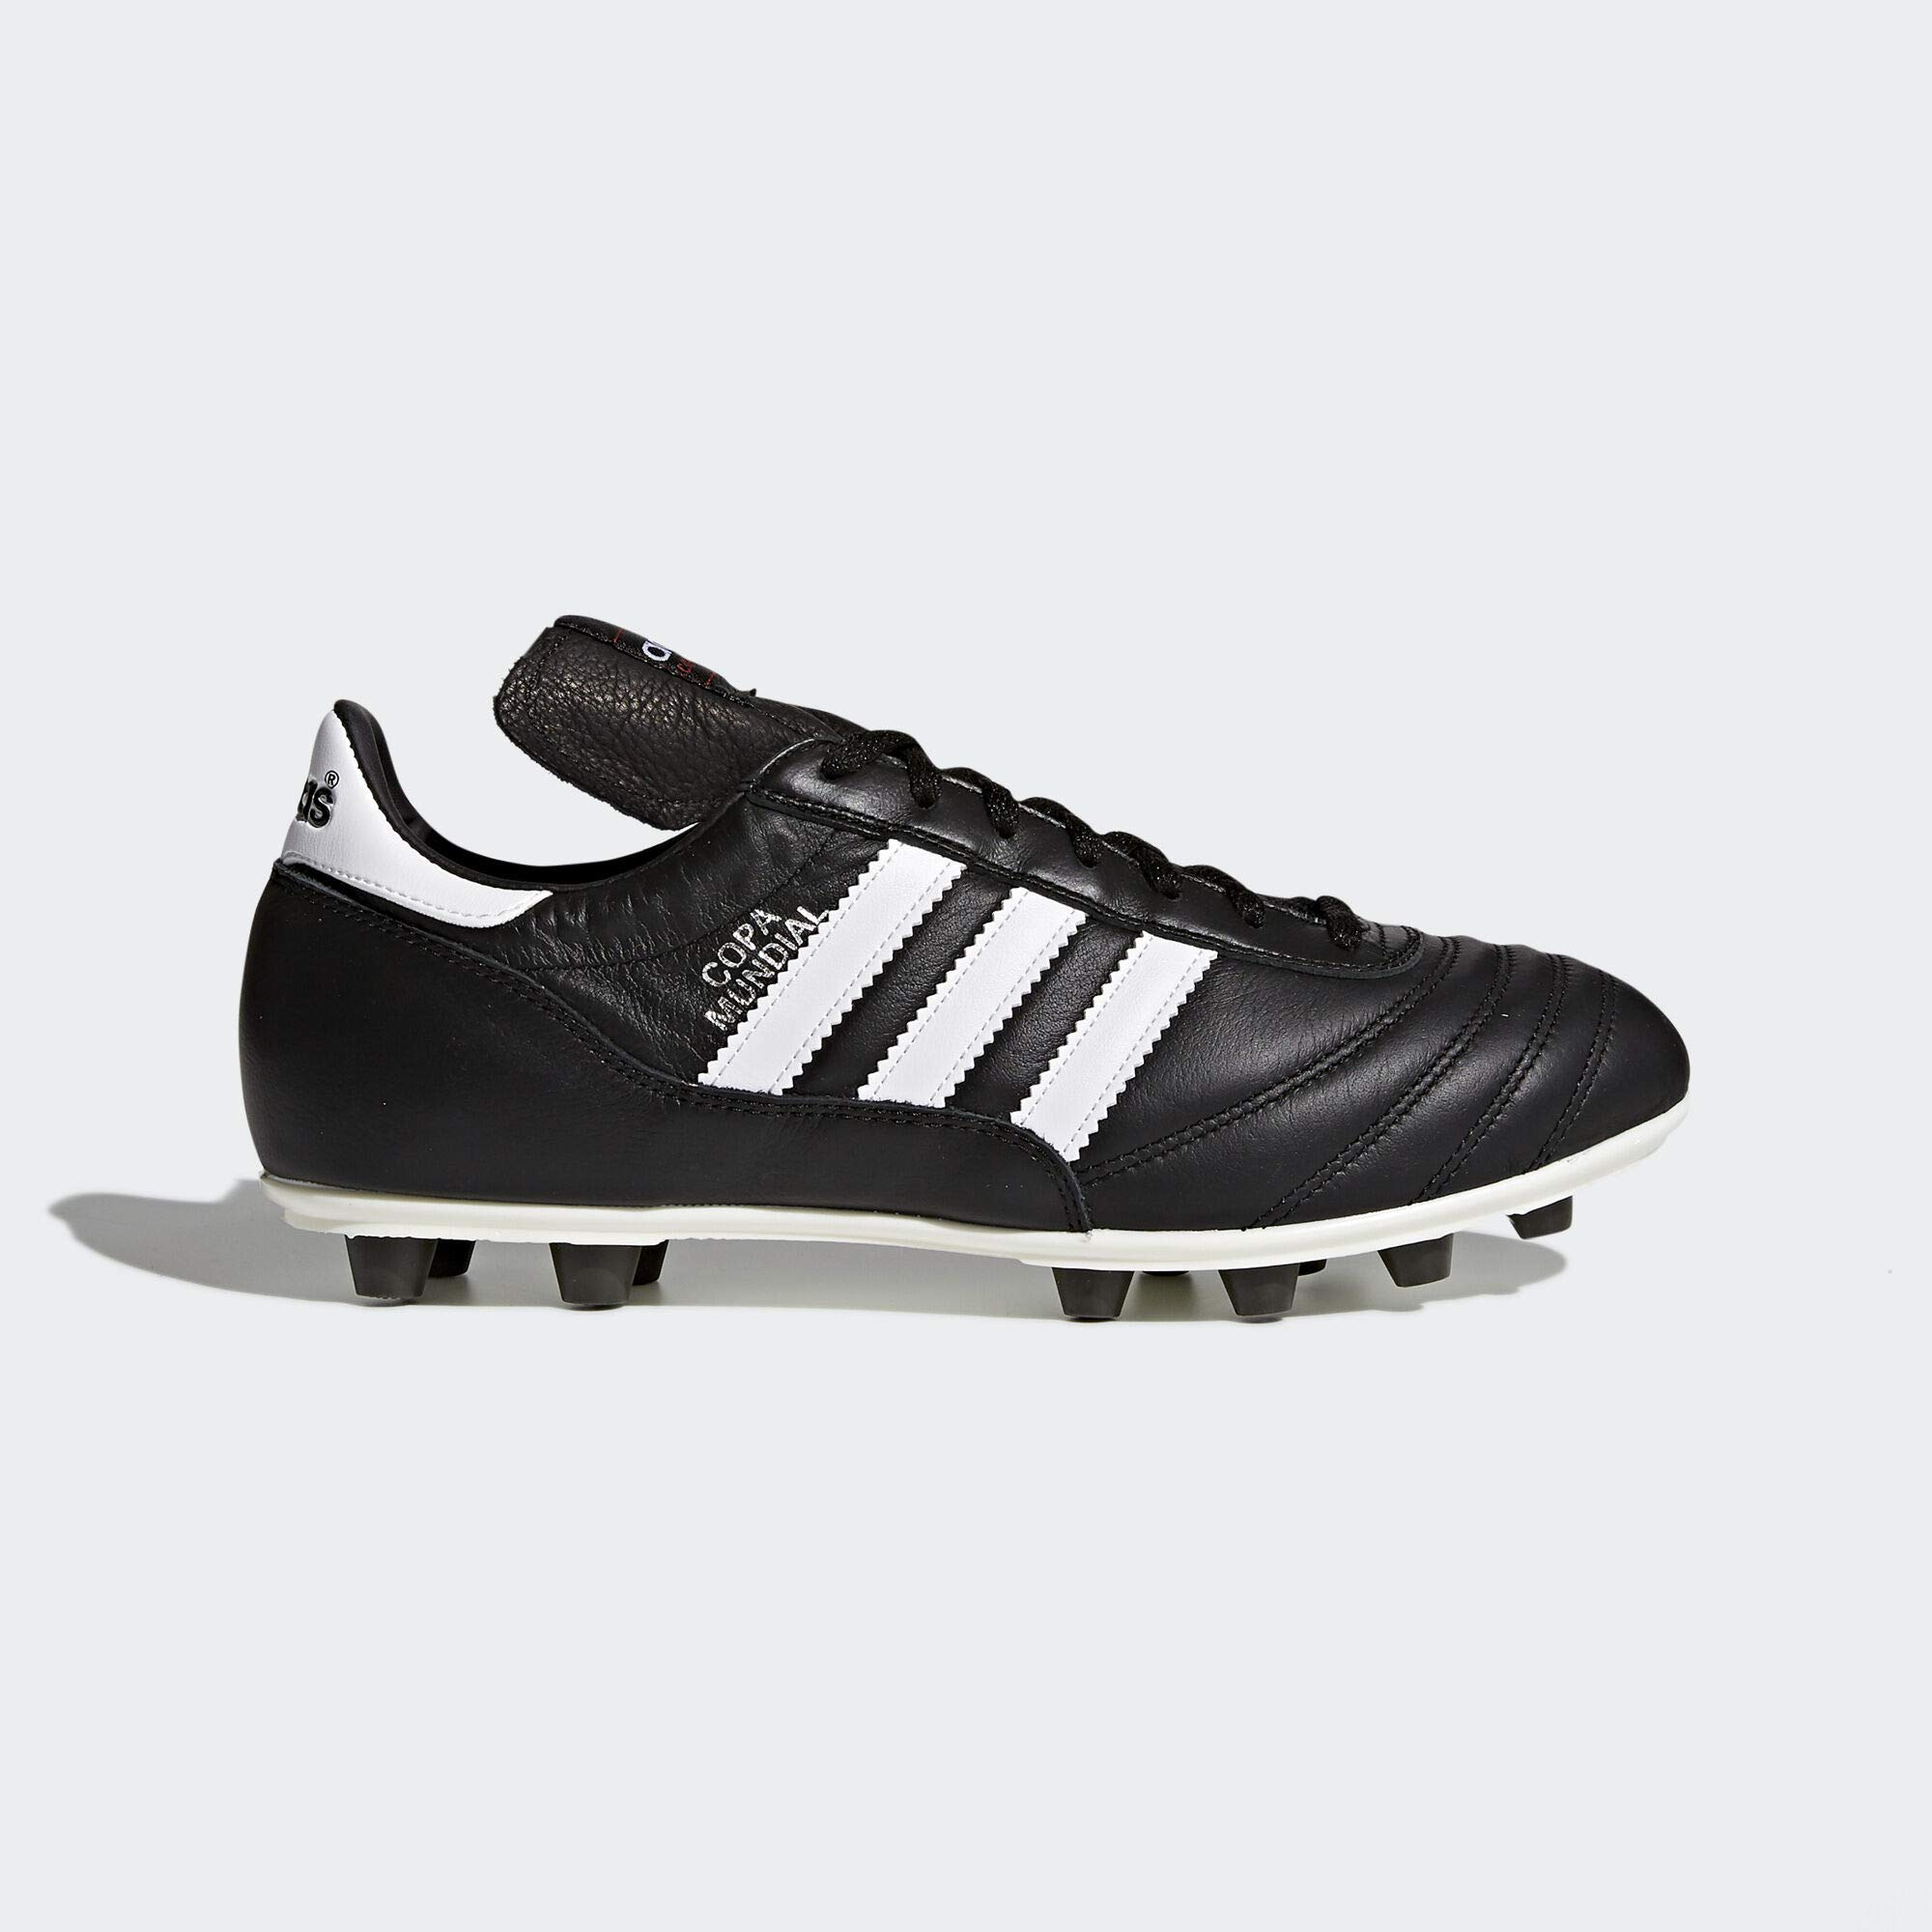 adidas Performance Men's Copa Mundial Soccer Shoe,Black/White/Black,12.5 M US by adidas